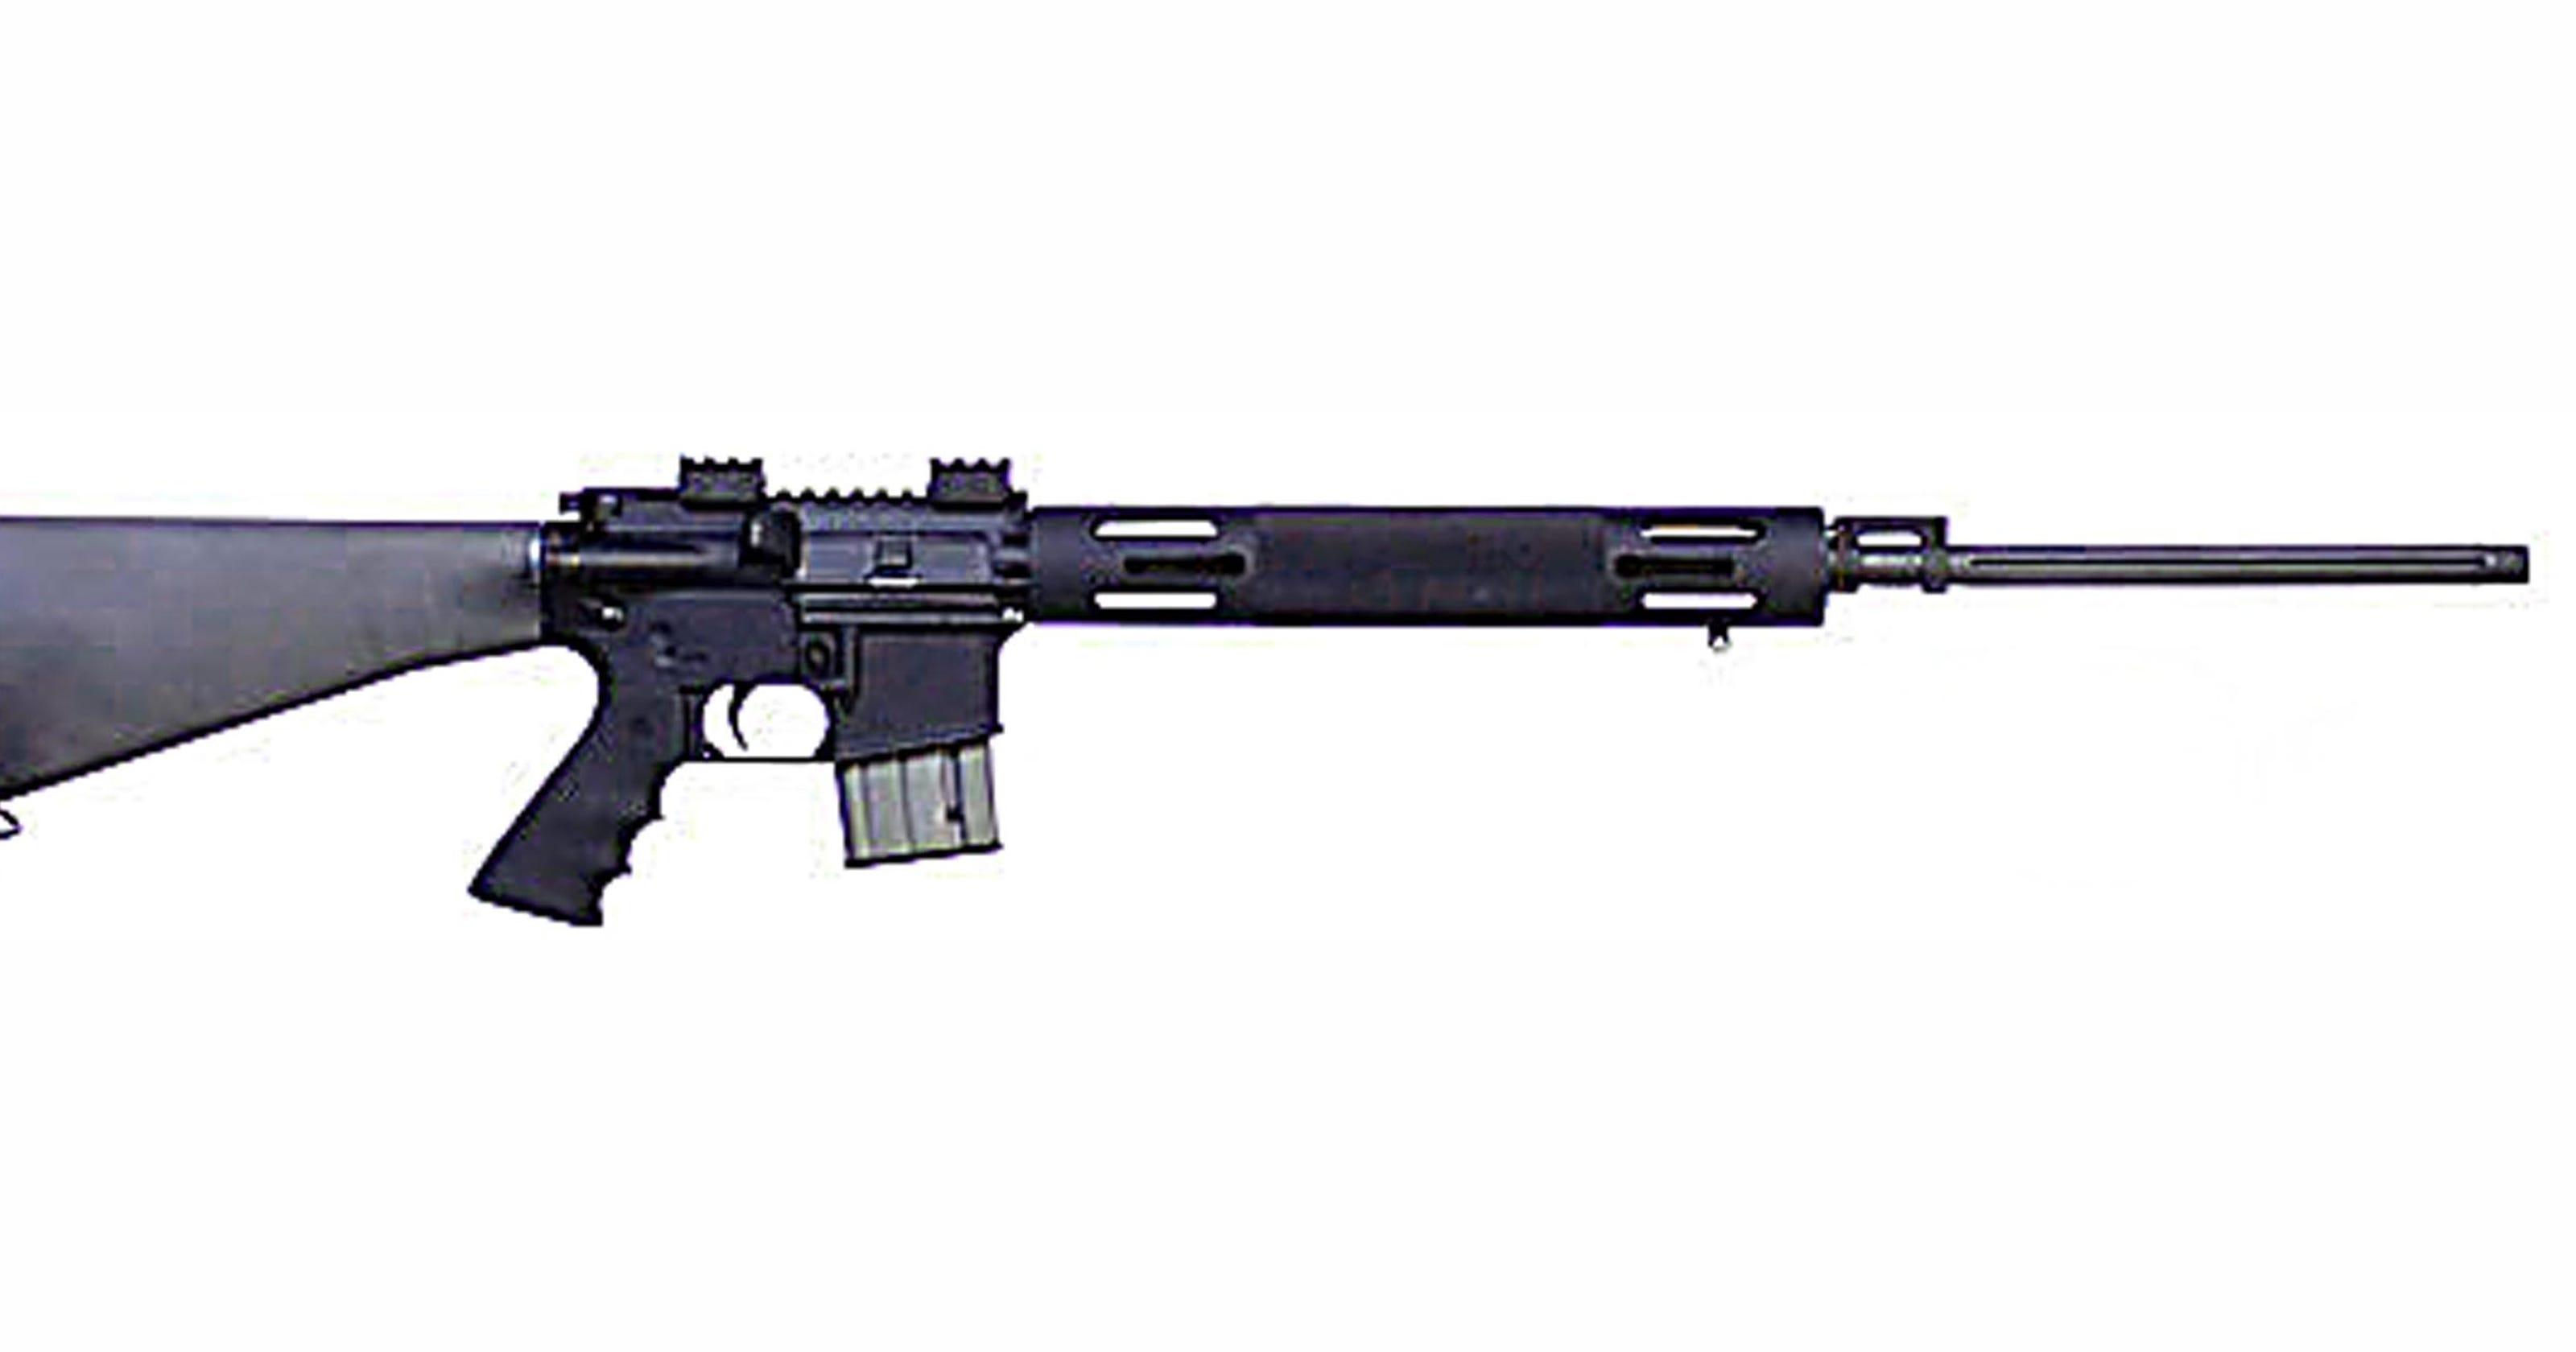 Gunmakers Stocks Continue To Lose Ground